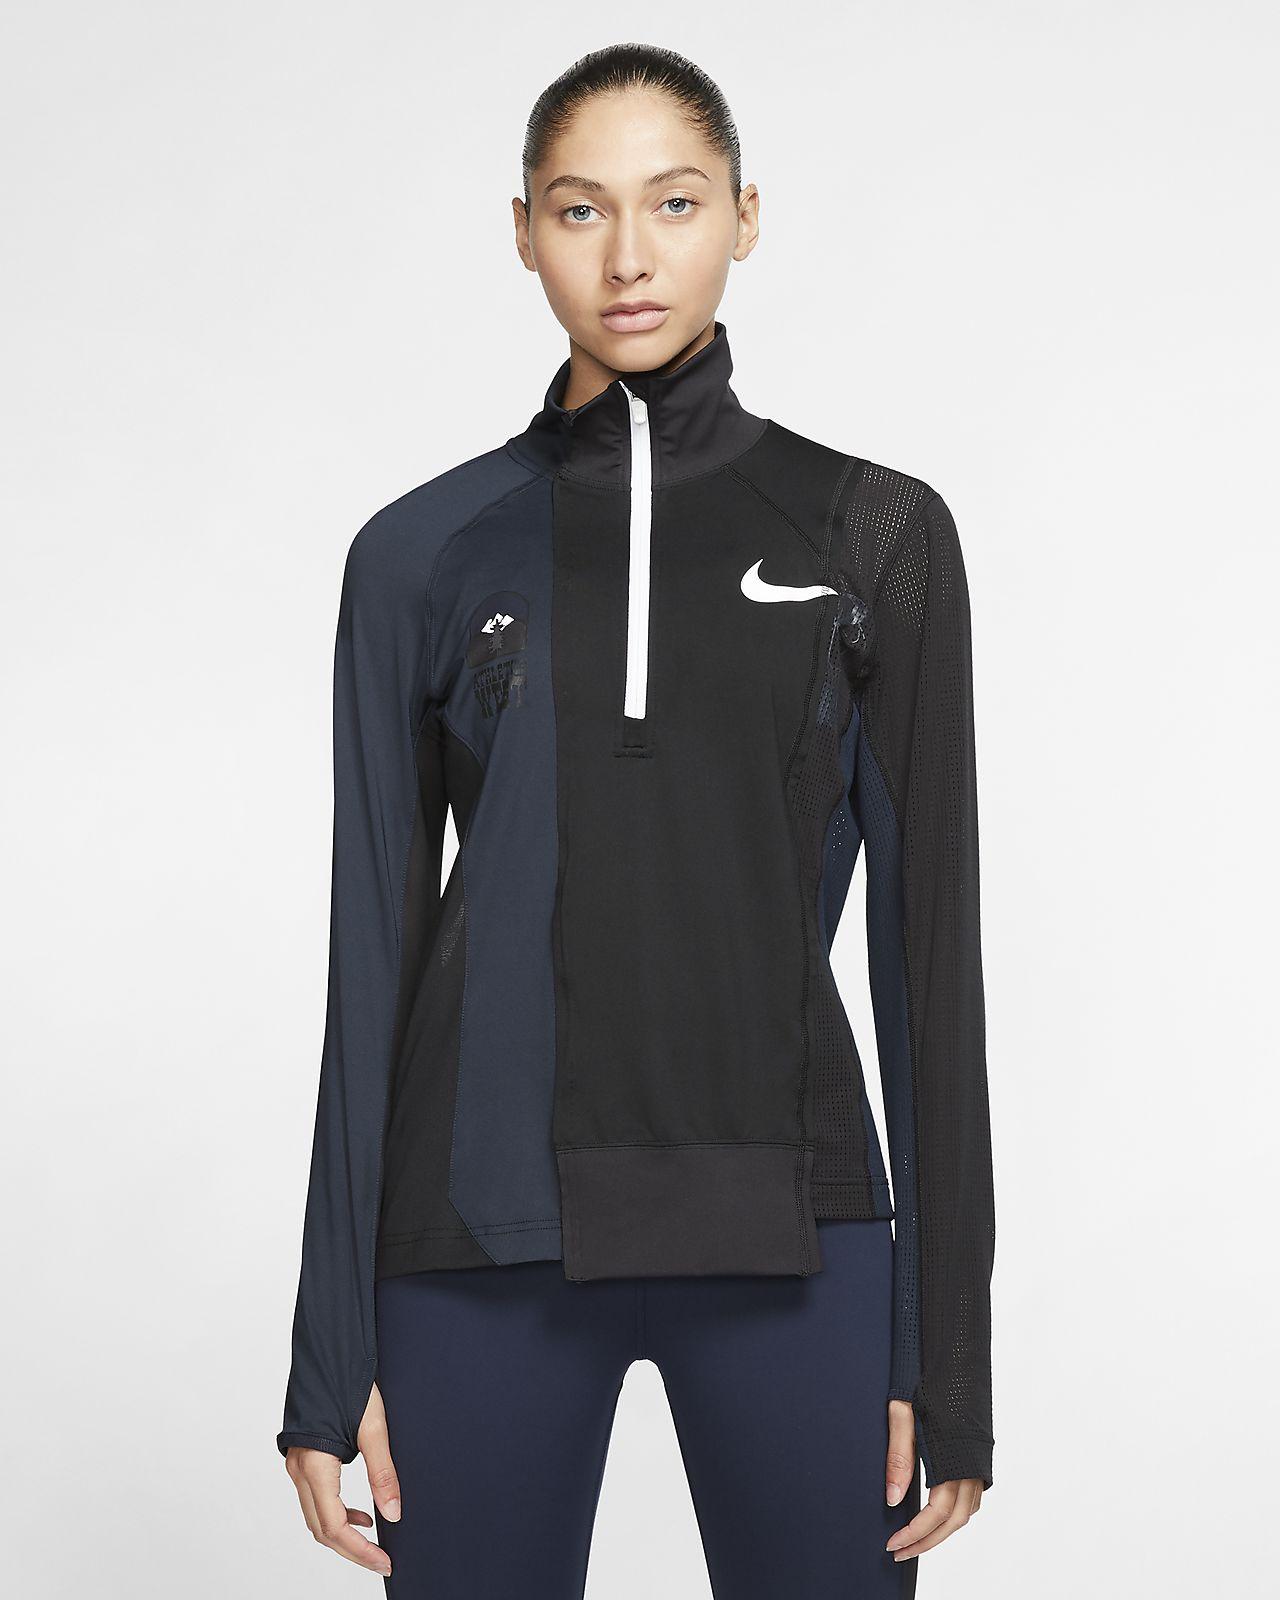 Nike x Sacai Women's Half-Zip Running Jacket